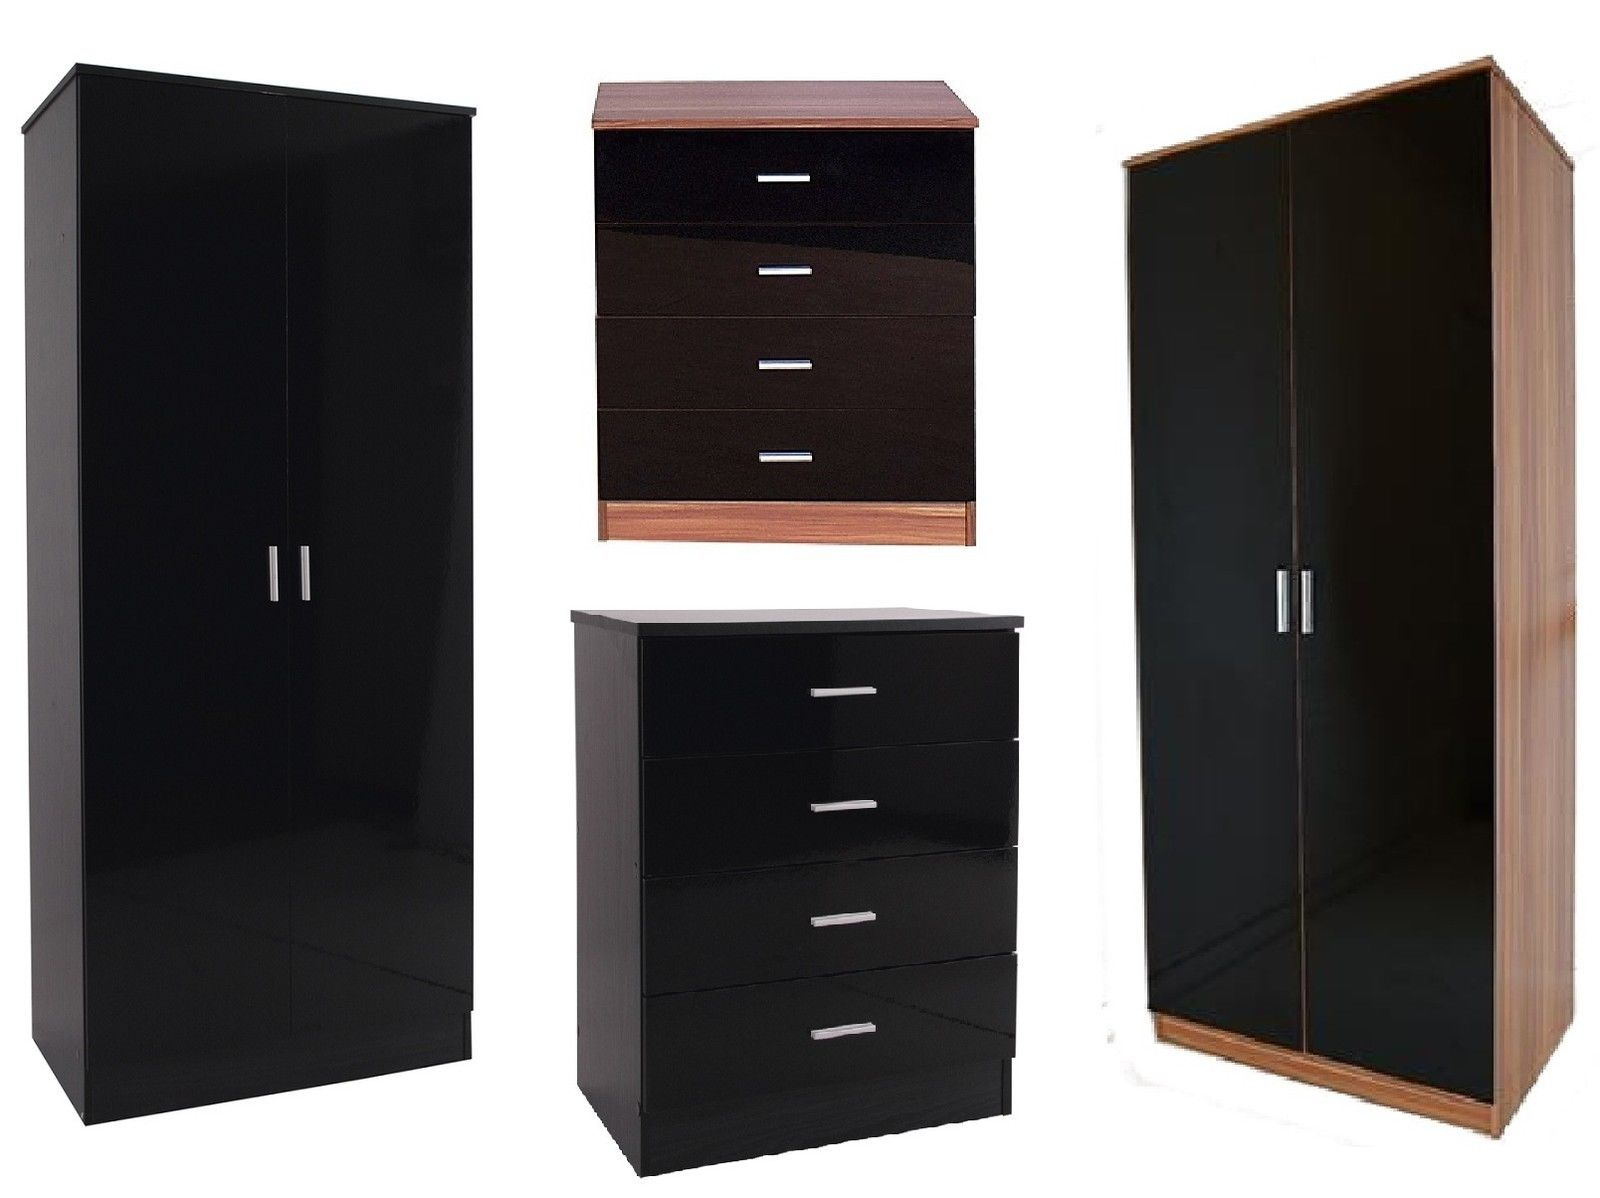 Caspian black high gloss bedroom furniture set wardrobe - Black chest of drawers for bedroom ...